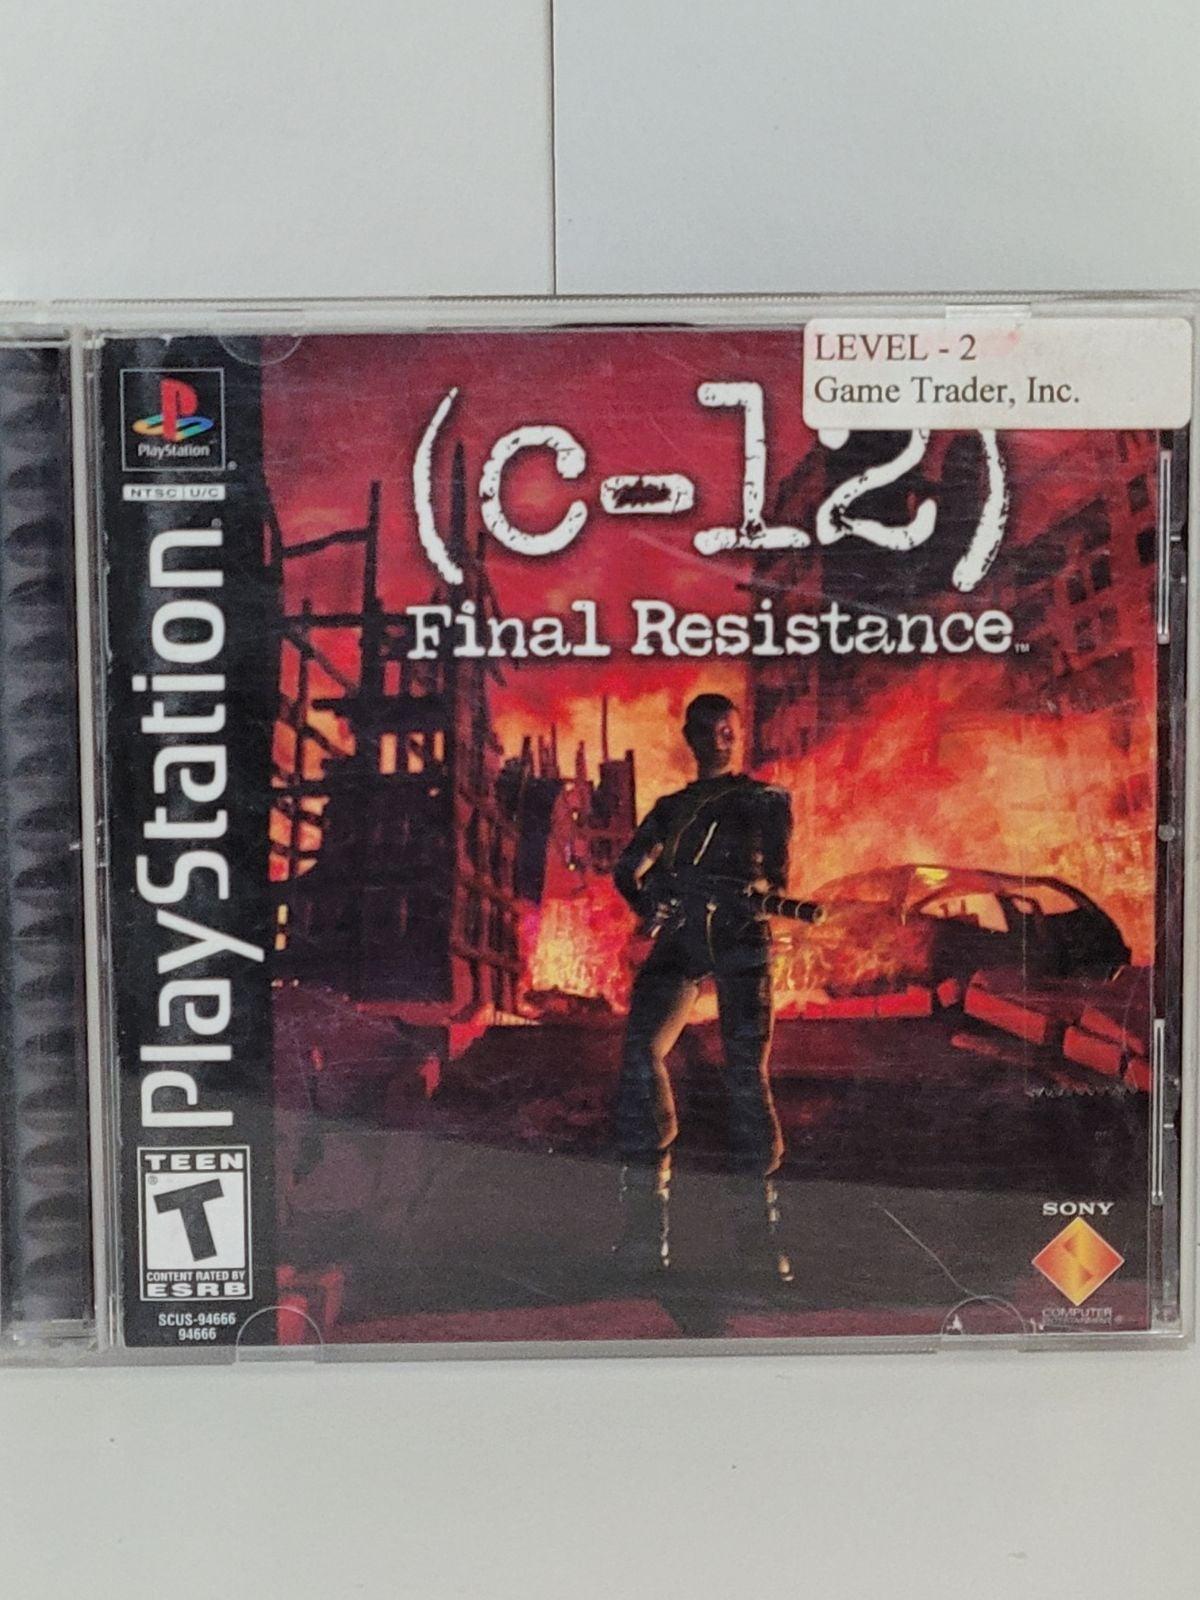 C-12: Final Resistance on Playstation 1